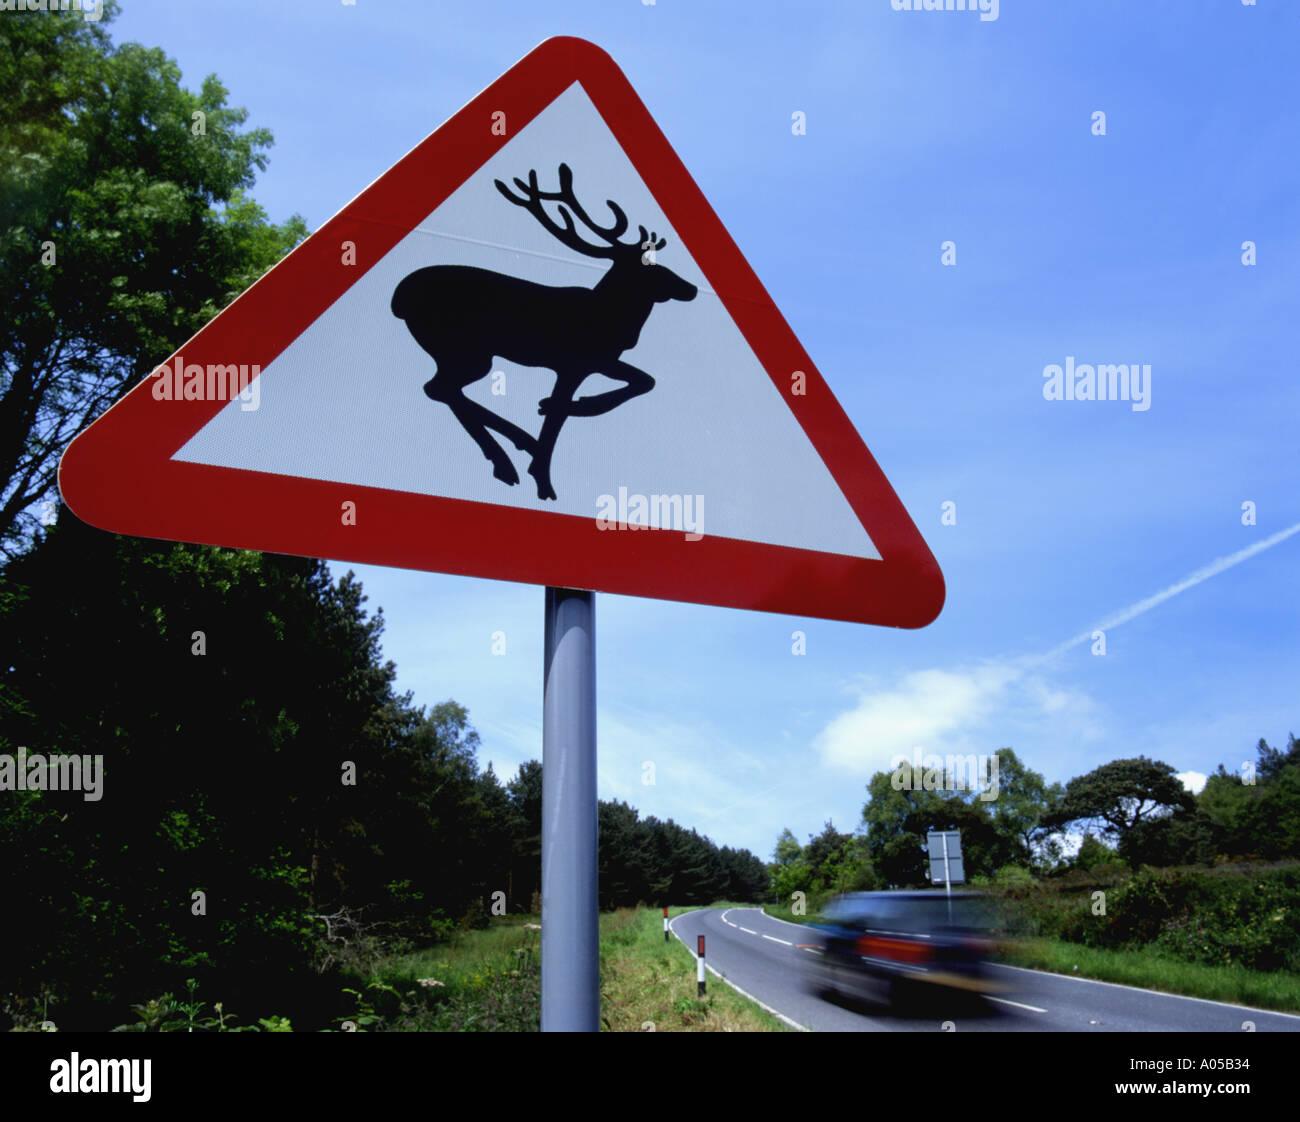 A roadside deer warning, near Teignmouth, Devon, England, Great Britain. - Stock Image